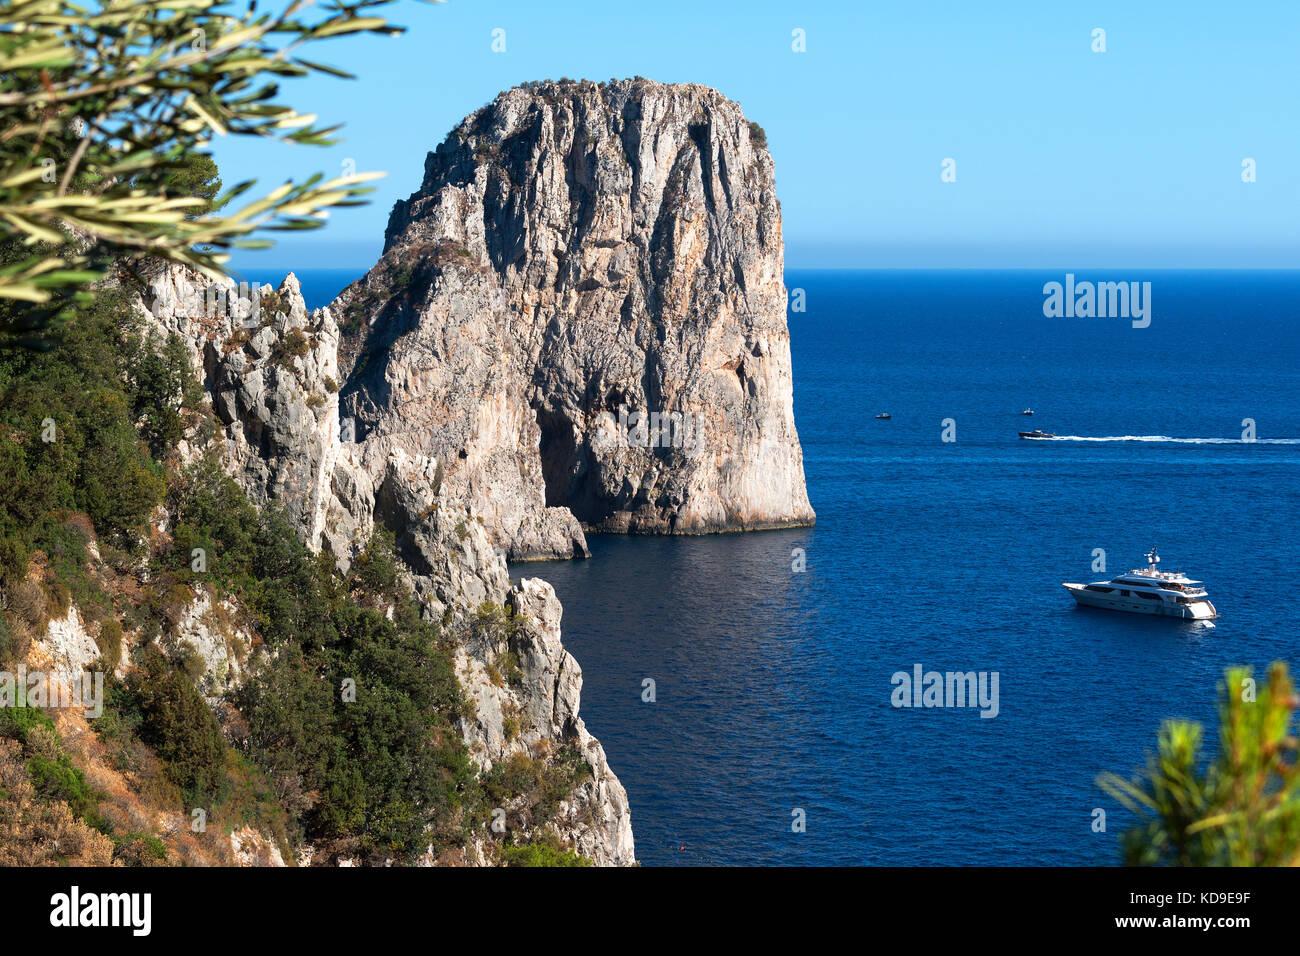 the famous faraglioni rocks off the island of capri in the bay of naples, italy - Stock Image